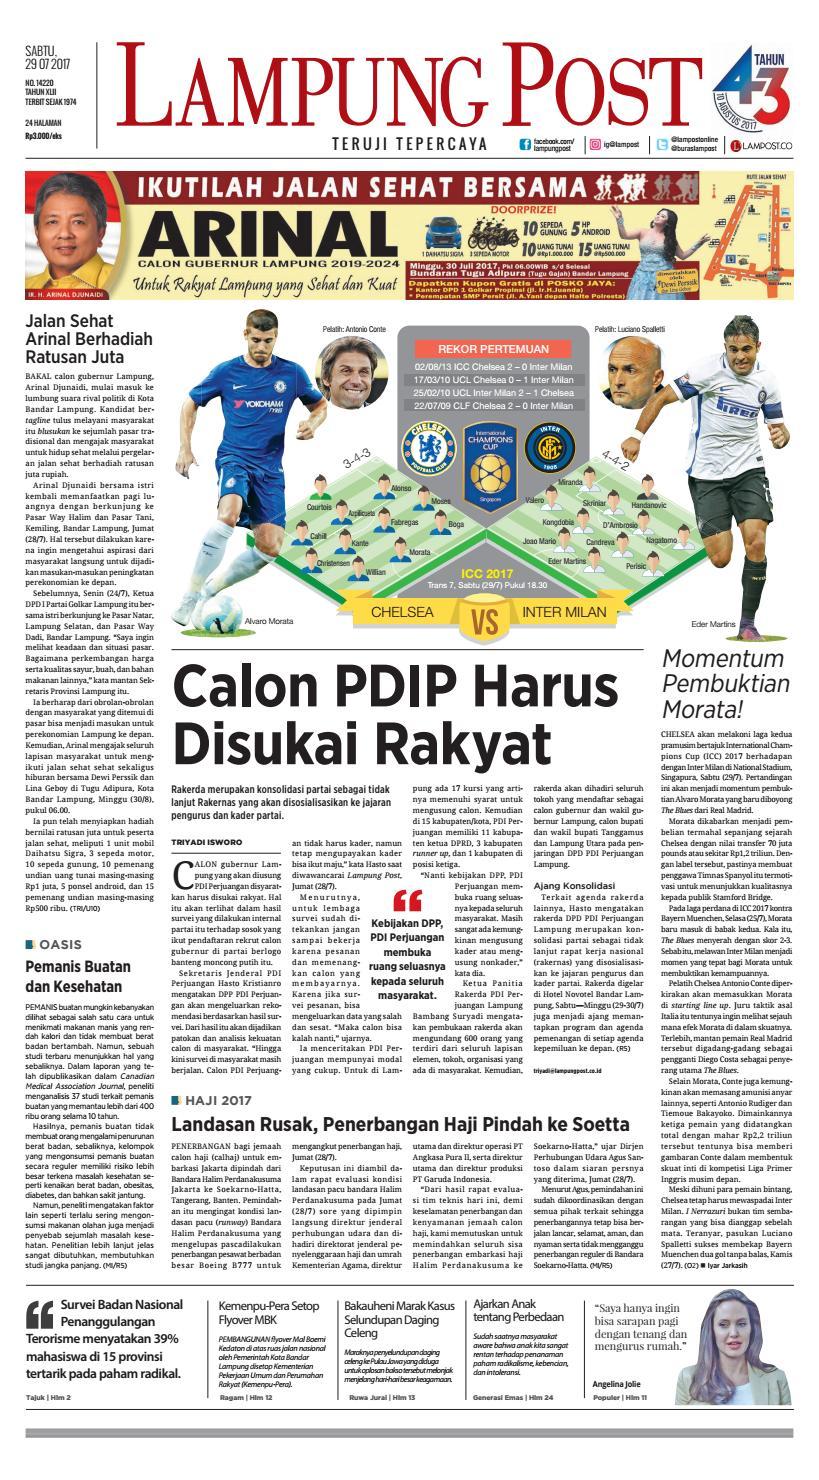 Lampung Post Sabtu 29 Juli 2017 By Issuu Tcash Vaganza 17 Botol Minum Olahraga Discovery 750ml Hitam